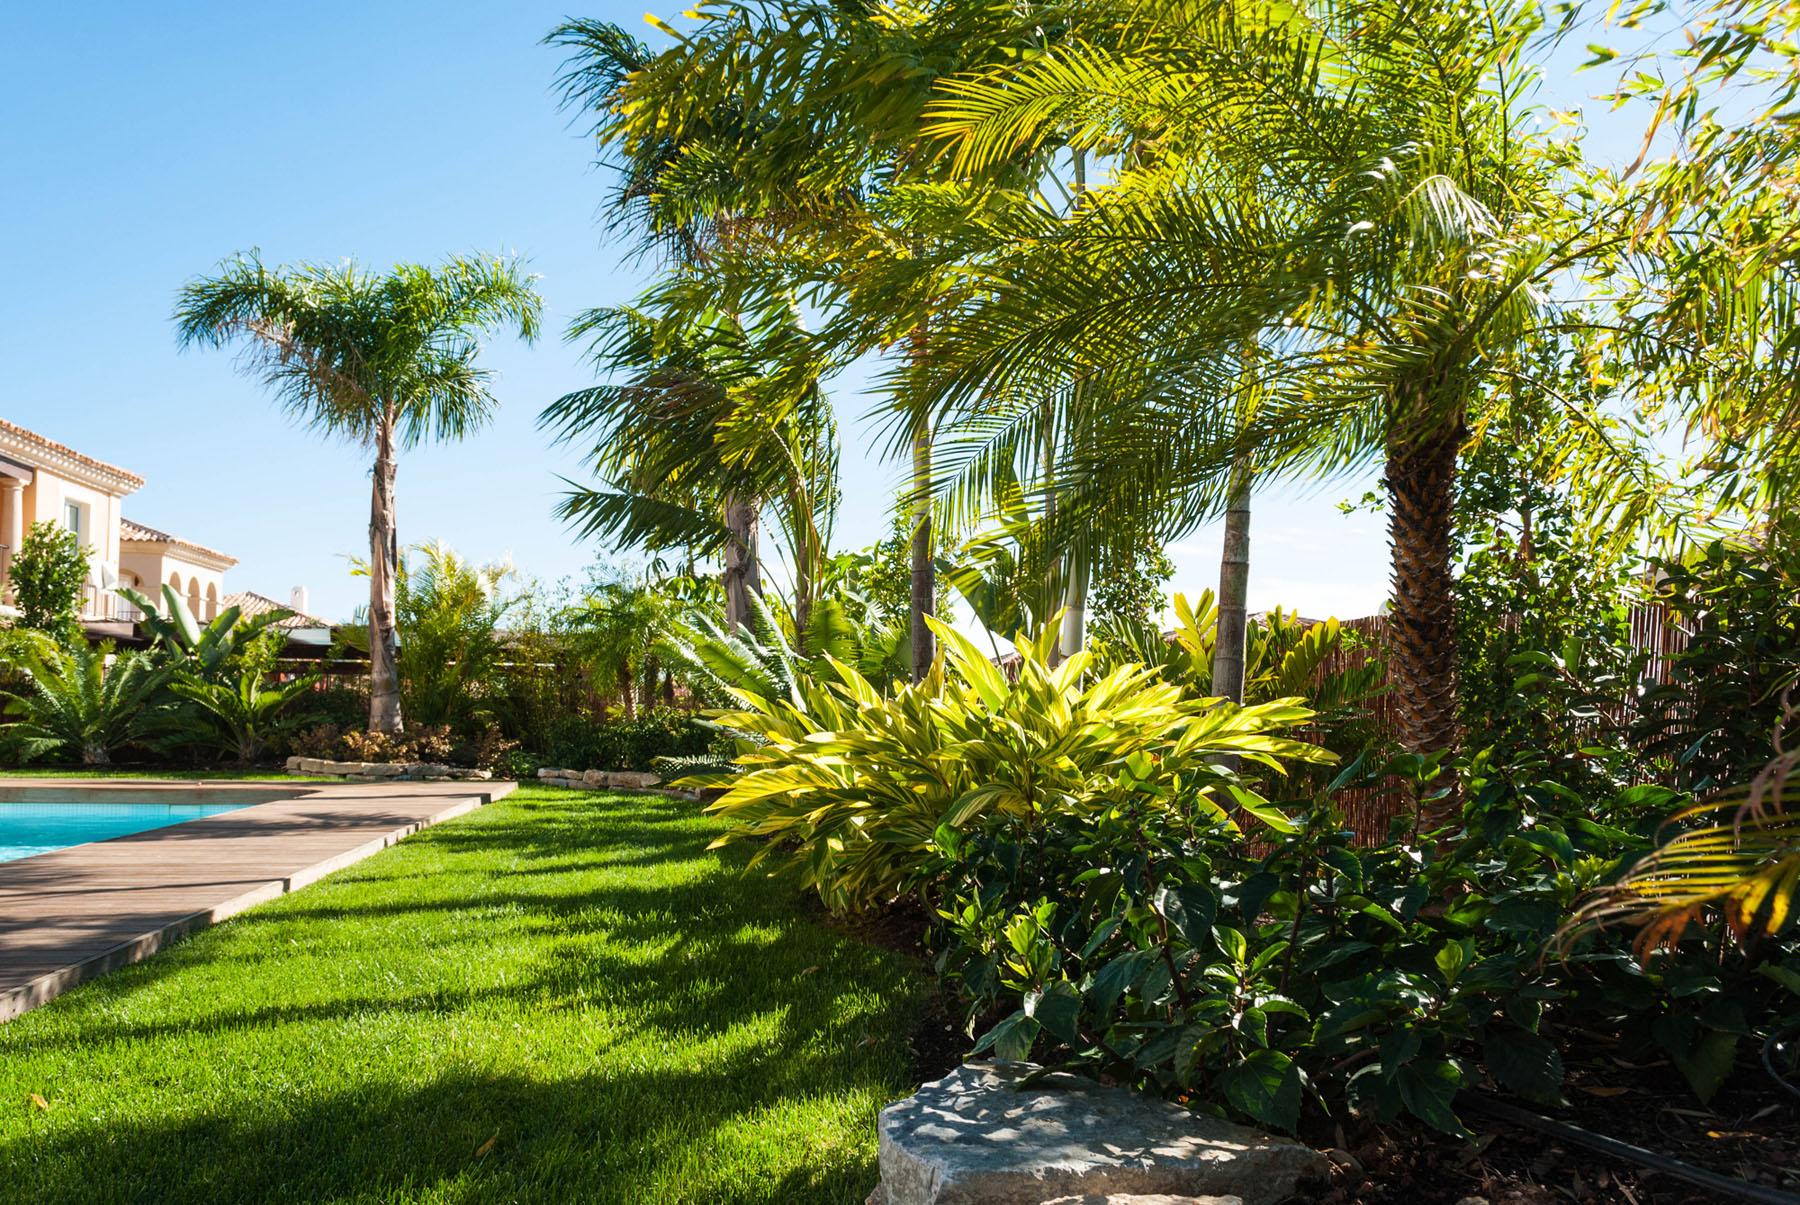 Dise o de jard n tropical villa de lujo en benidorm for Diseno futurista para un jardin con piscina